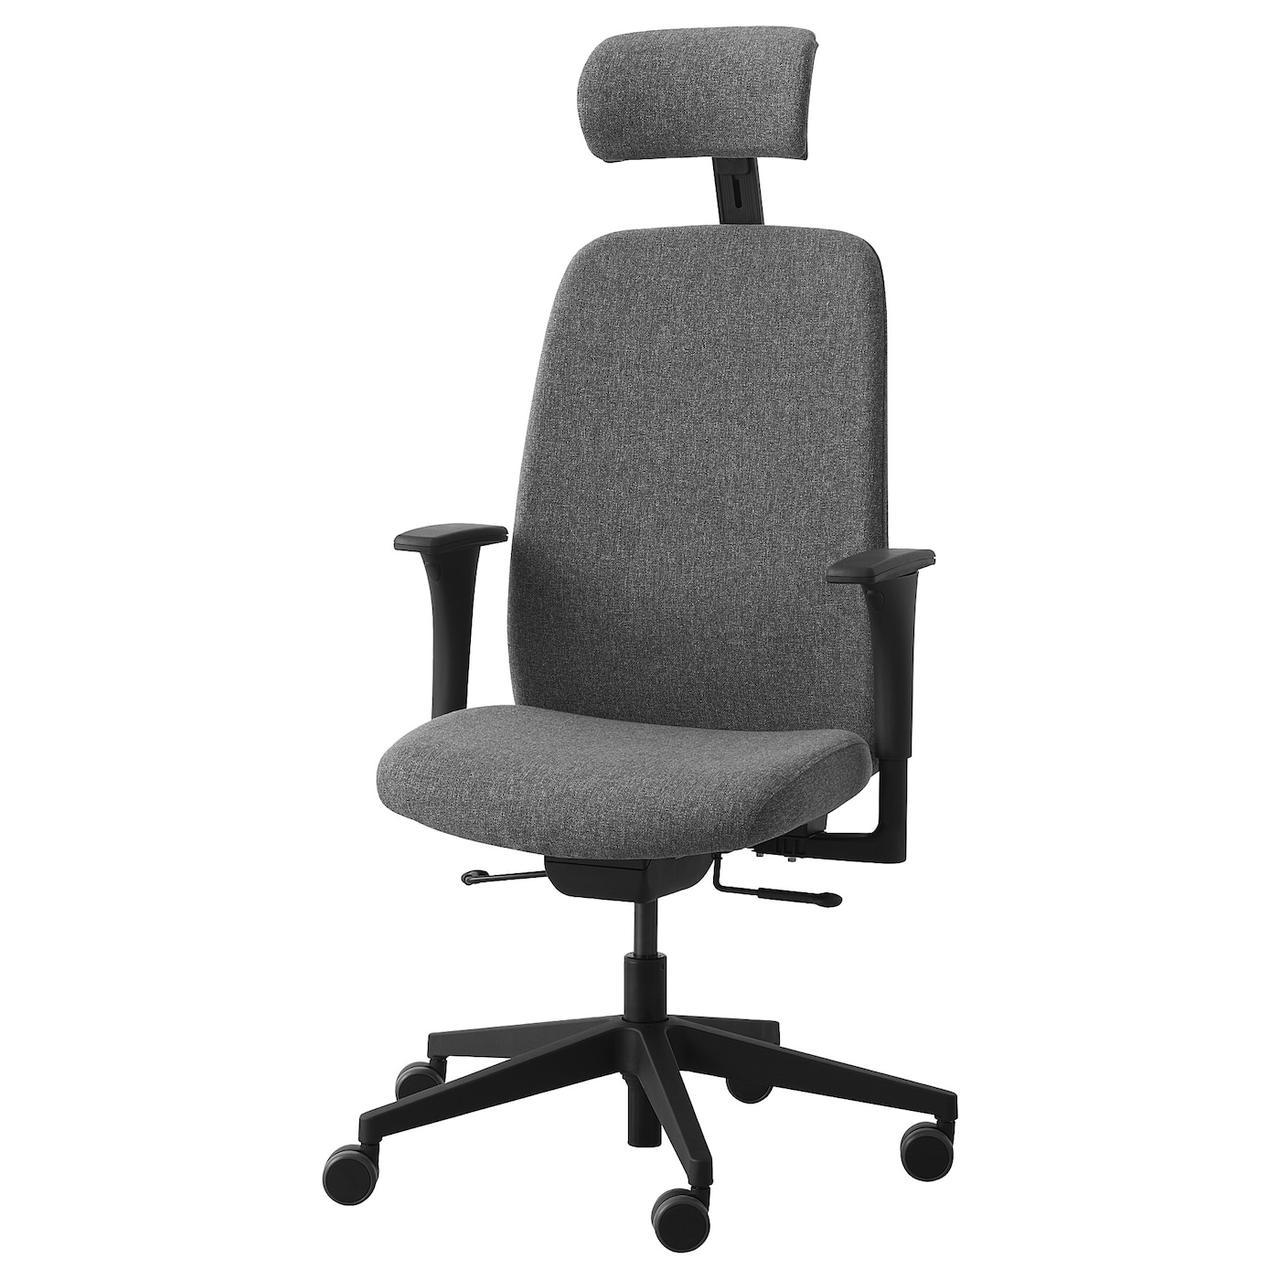 IKEA VALLFJÄLLET Офисное кресло